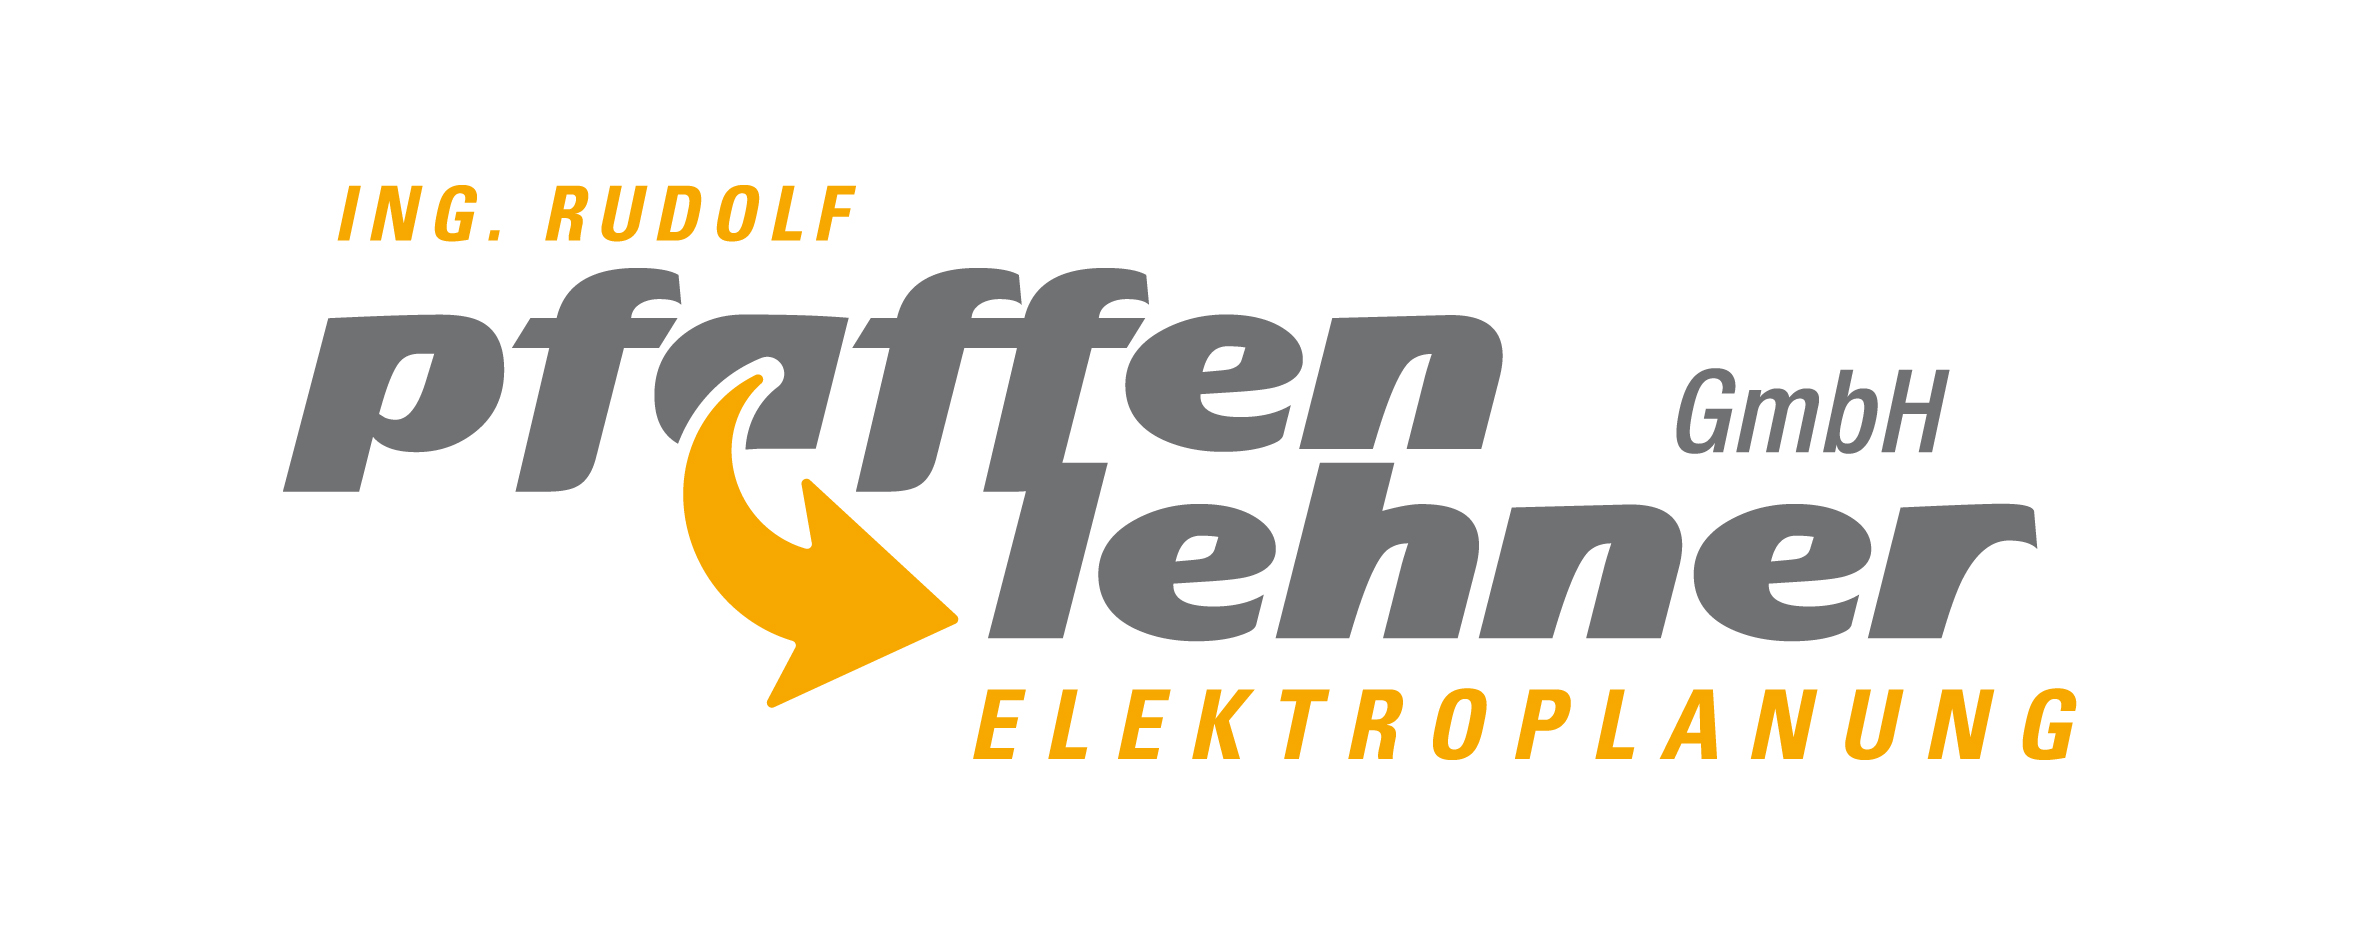 Ing. Rudolf Pfaffenlehner GmbH